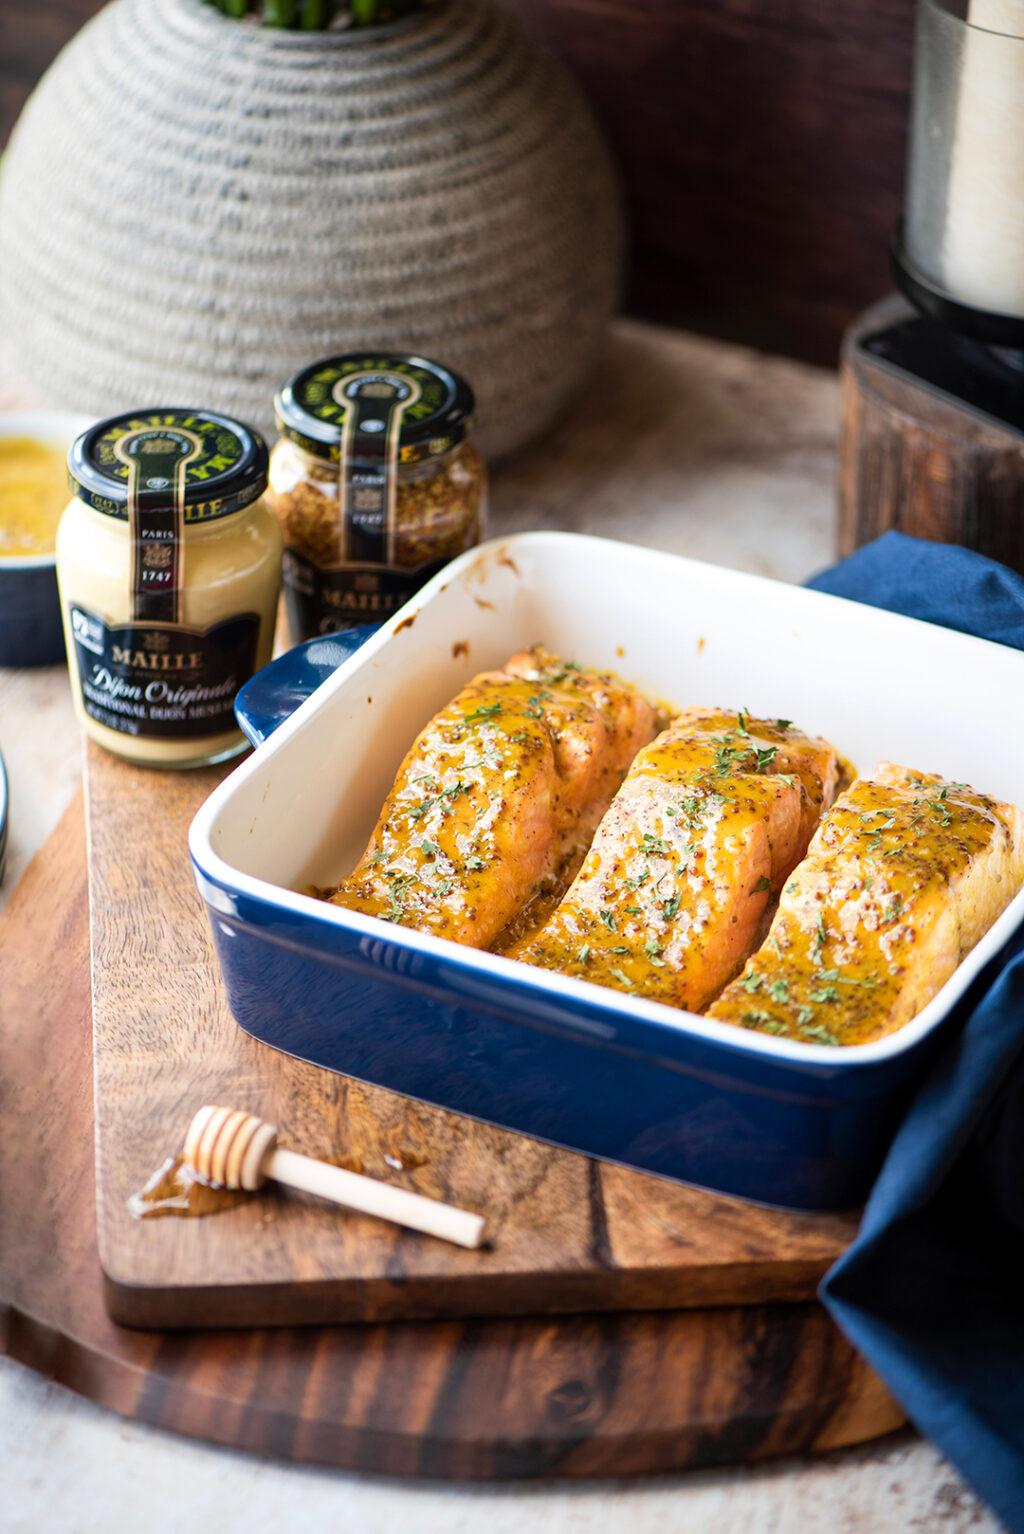 Honey-mustard glazed salmon is baking dish